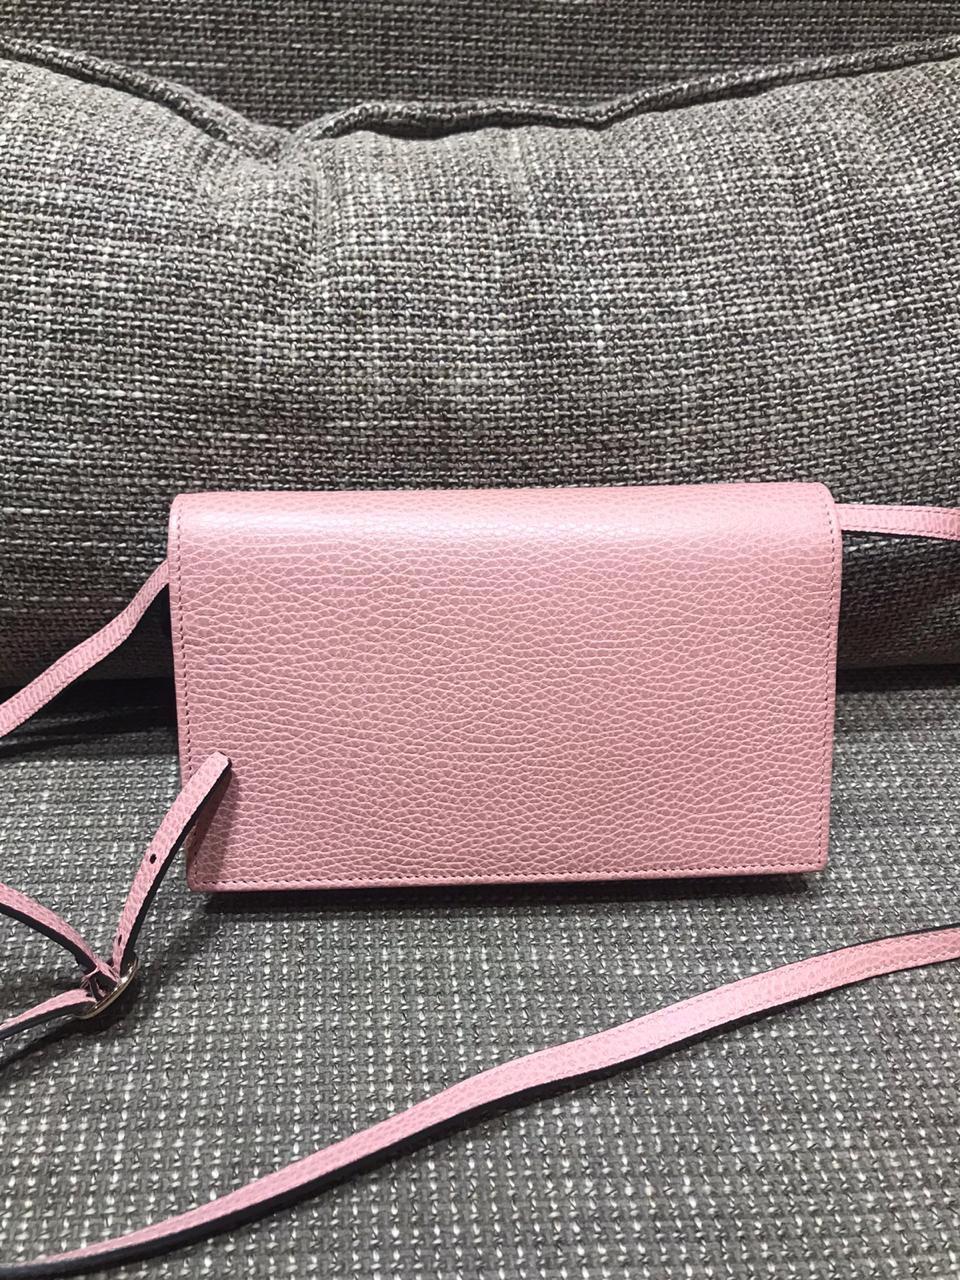 Bolsa Gucci Rosa Claro Pequena